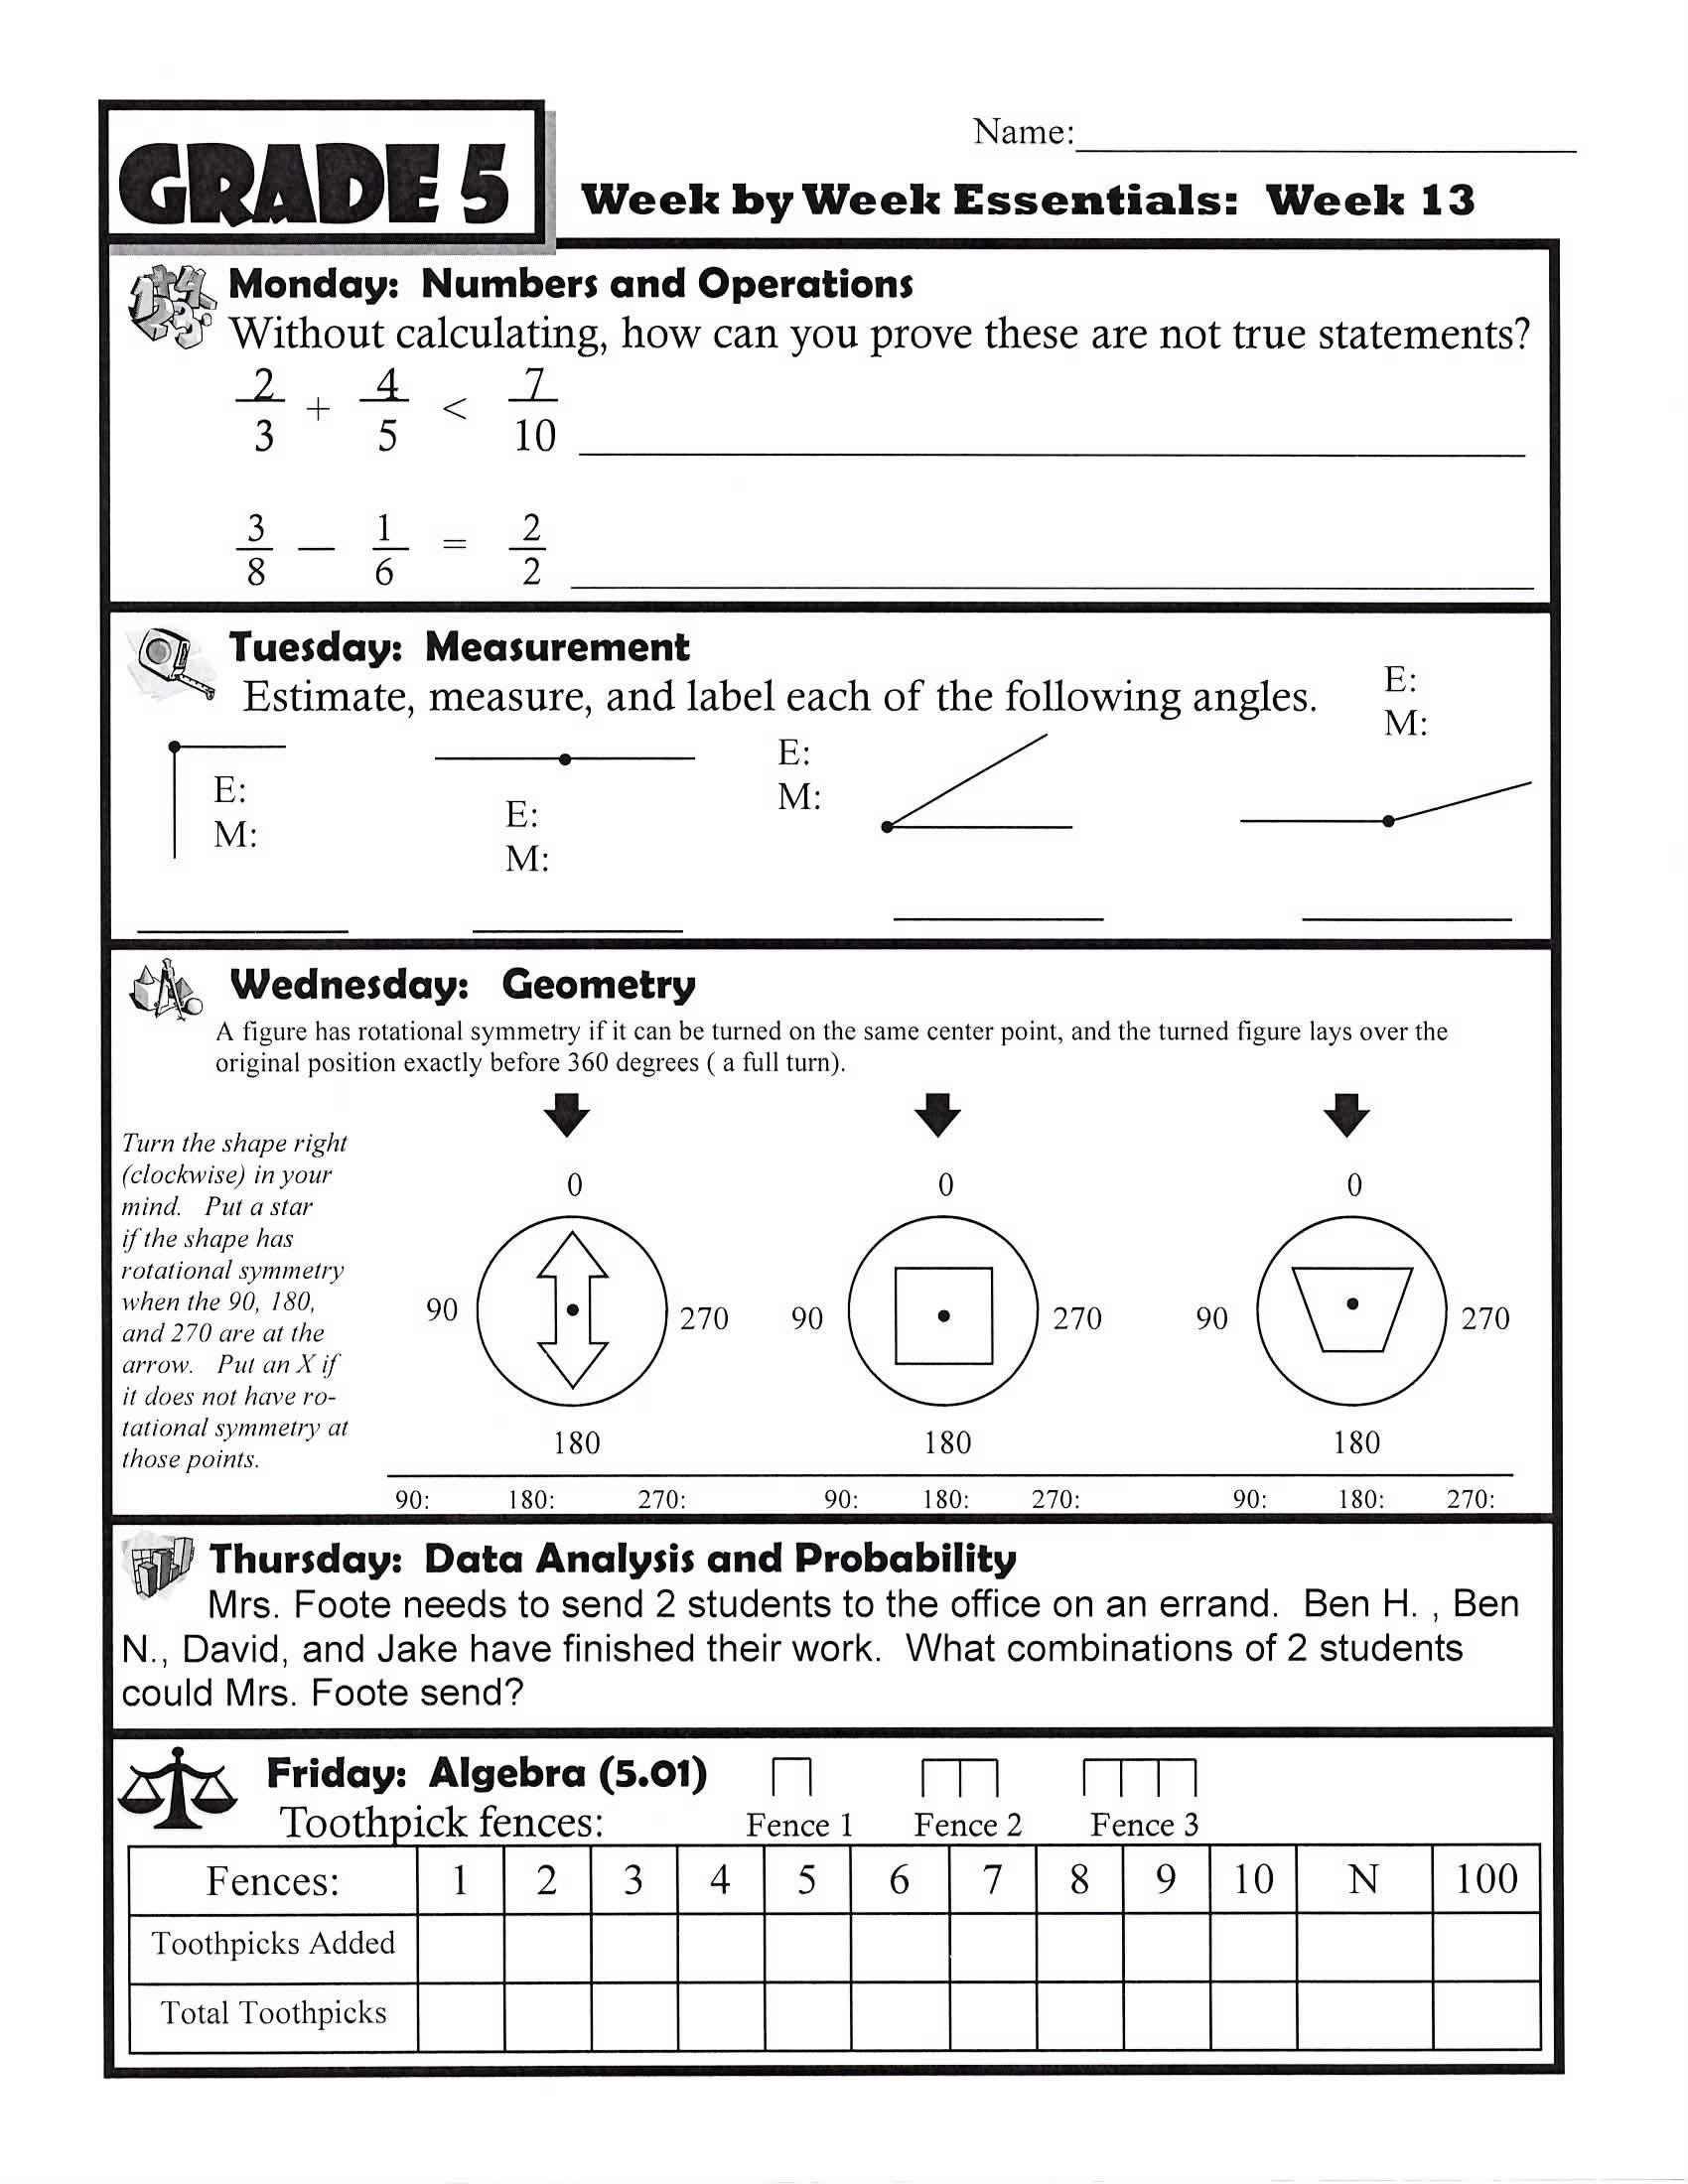 Week 13 Grade 5 Page 1